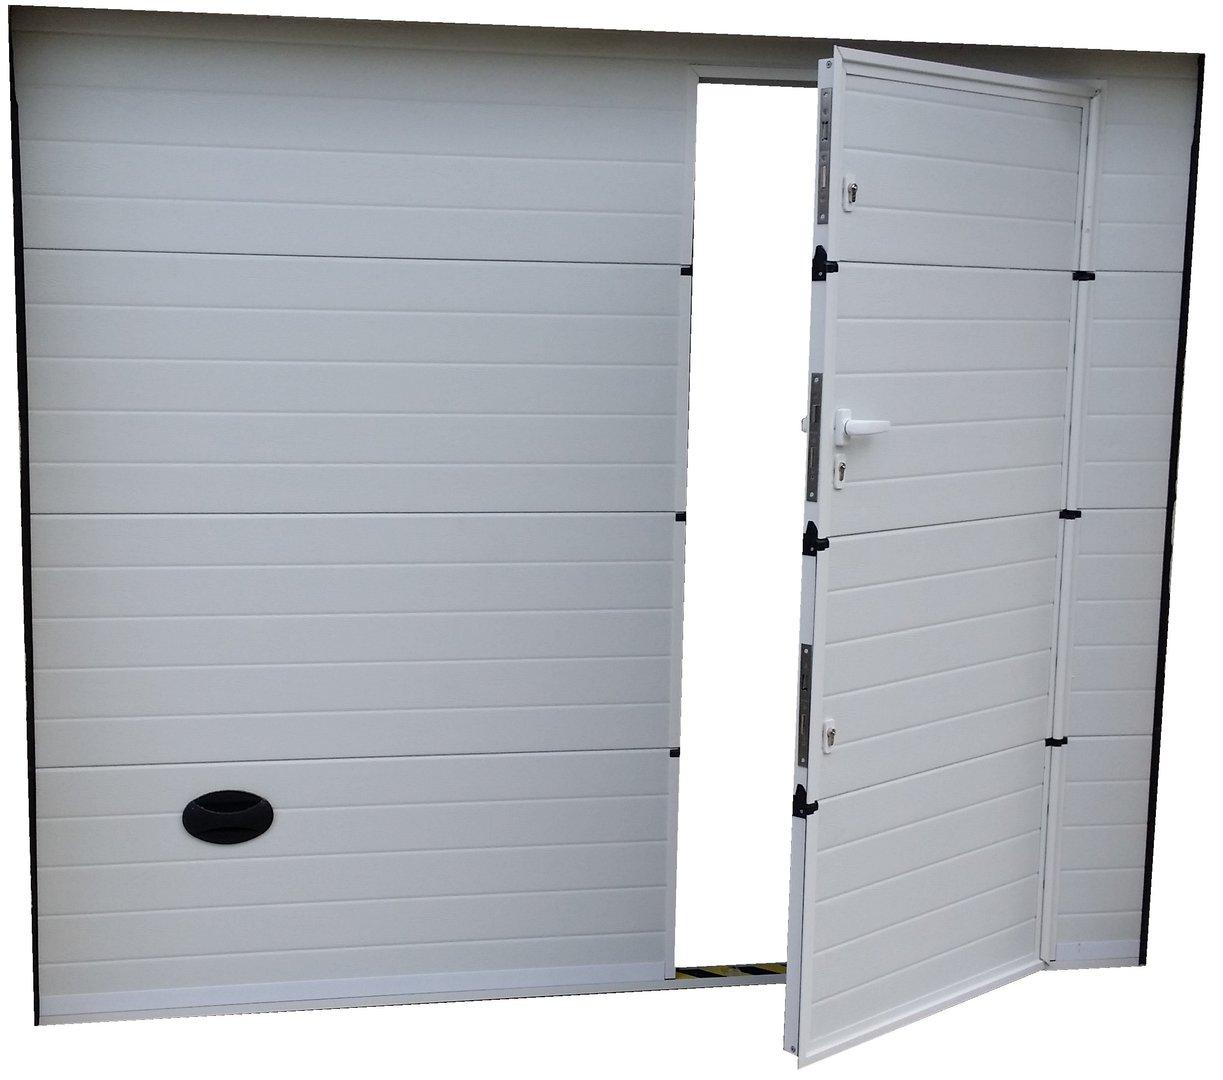 porte de garage avec porte de service isolation id es. Black Bedroom Furniture Sets. Home Design Ideas